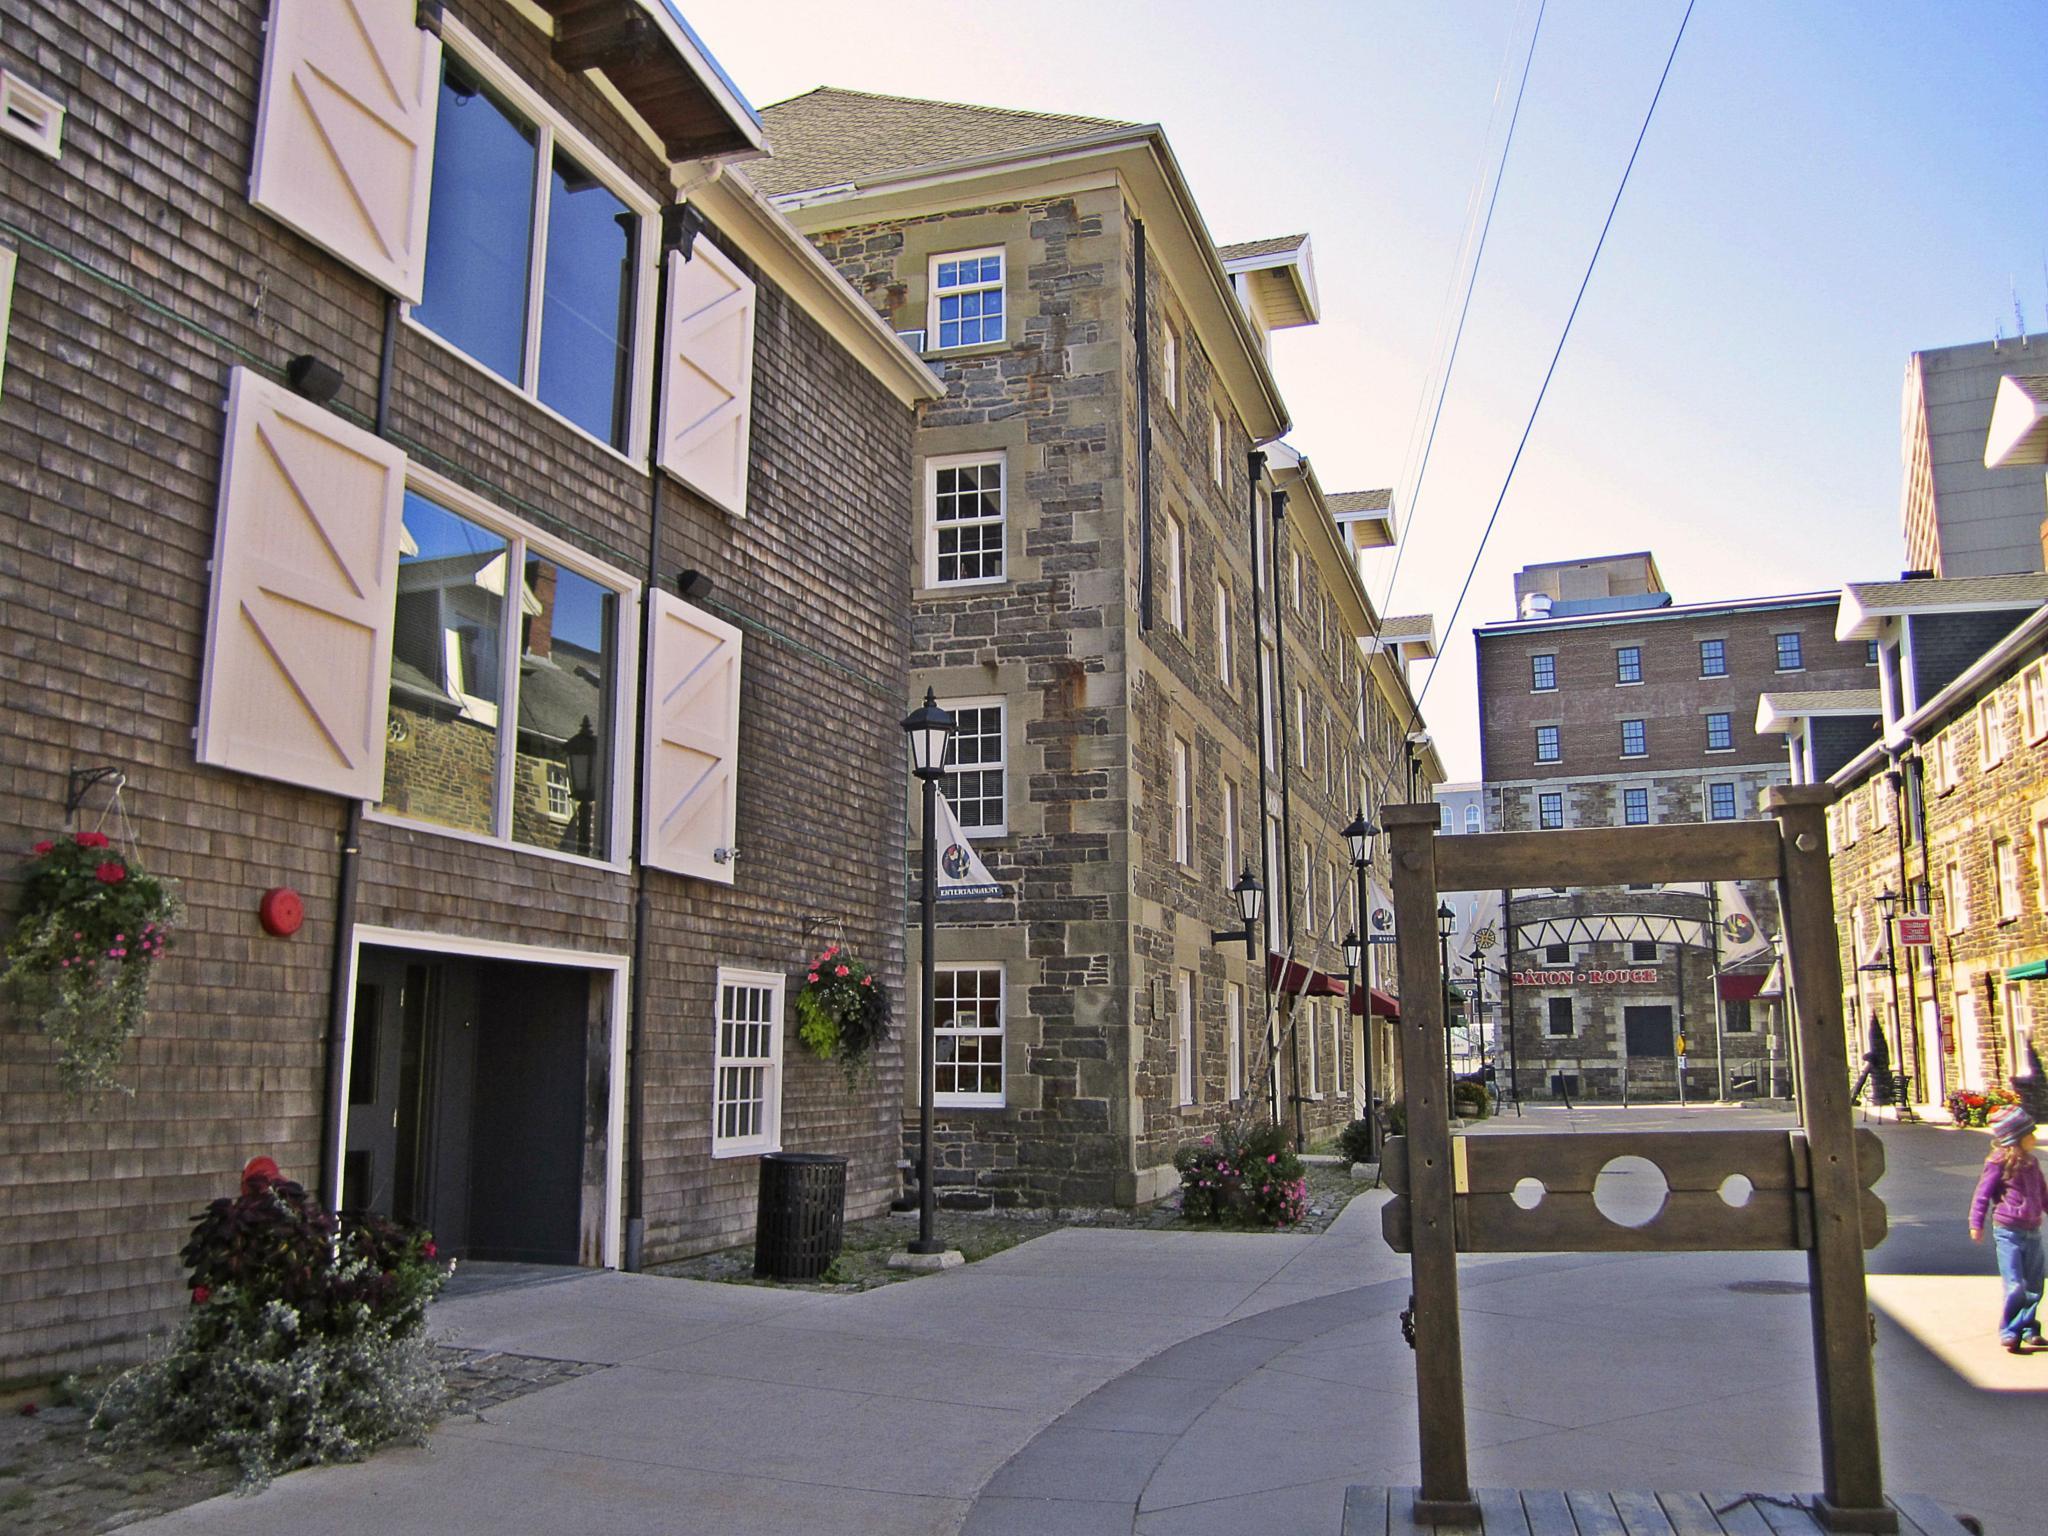 Halifax by gerry.lewicki